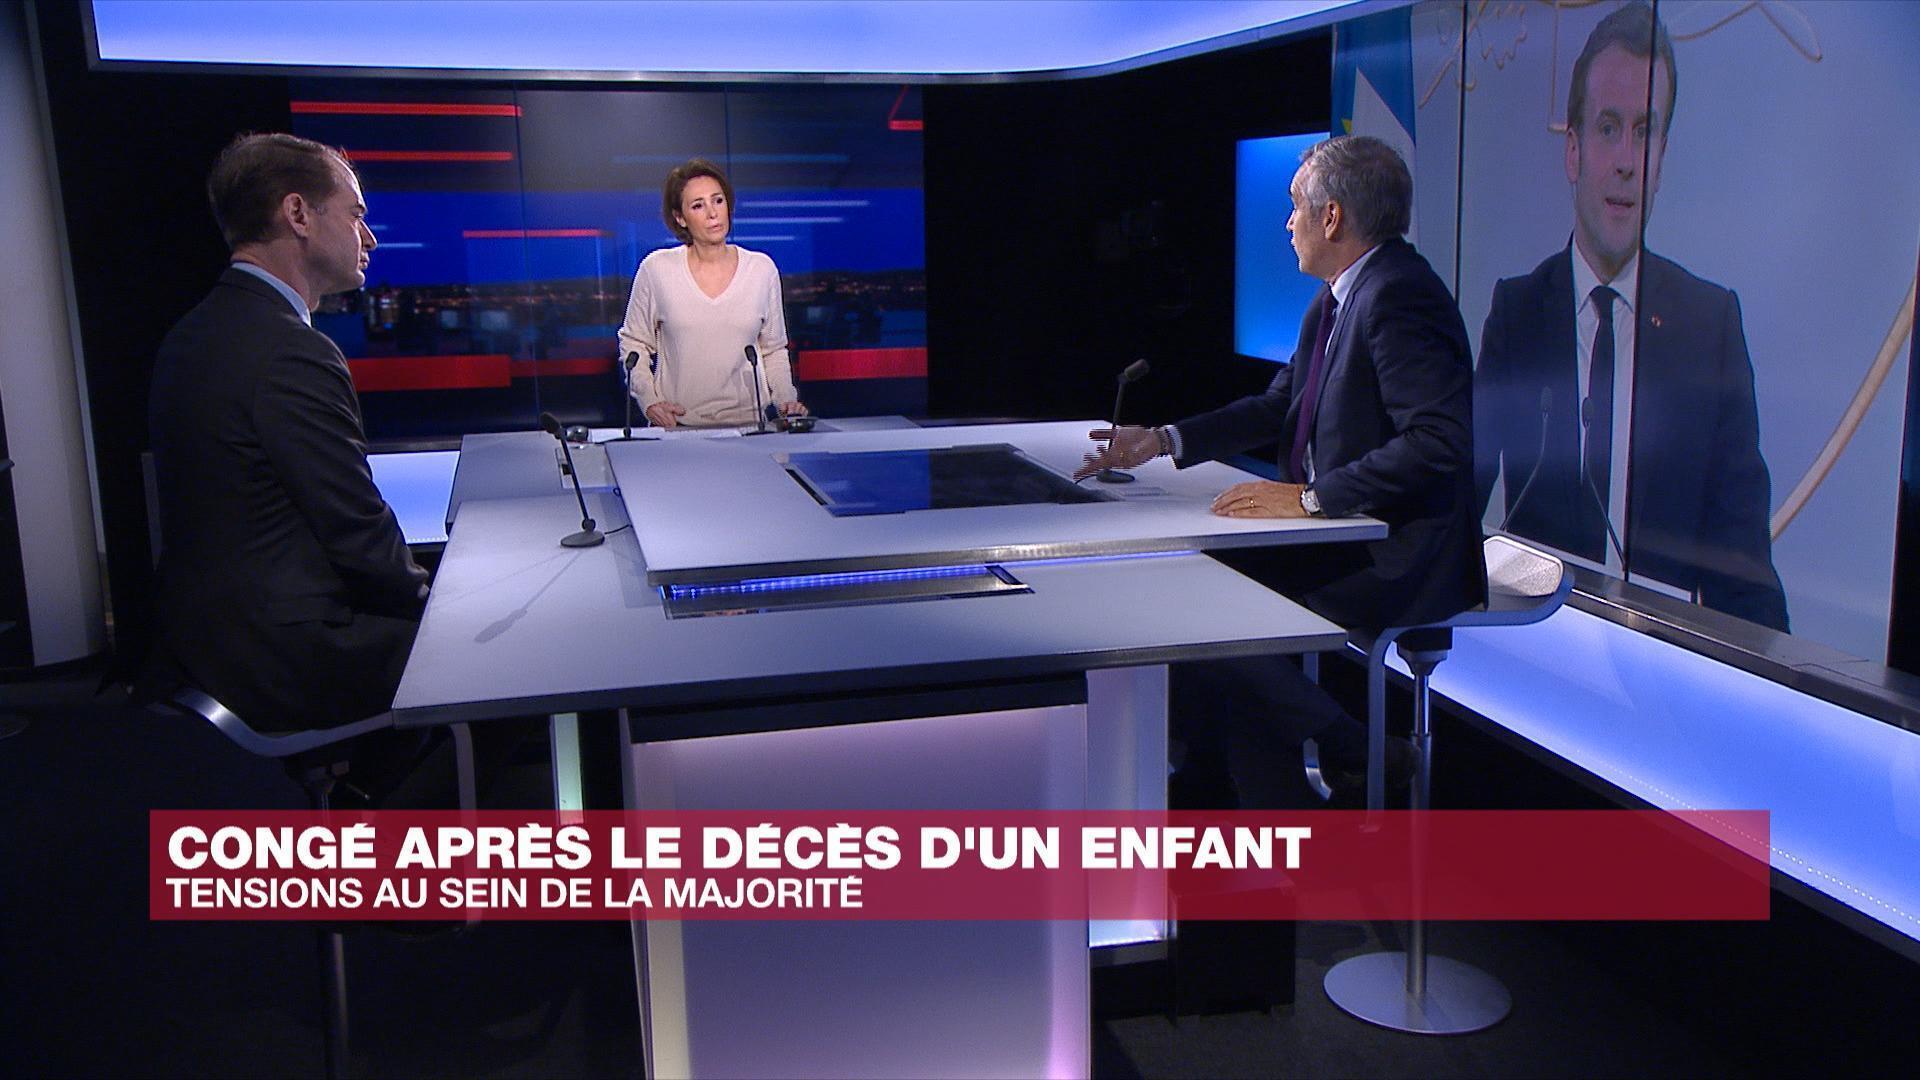 FR NEWS SEMAINE05_02_2020 09_59_30